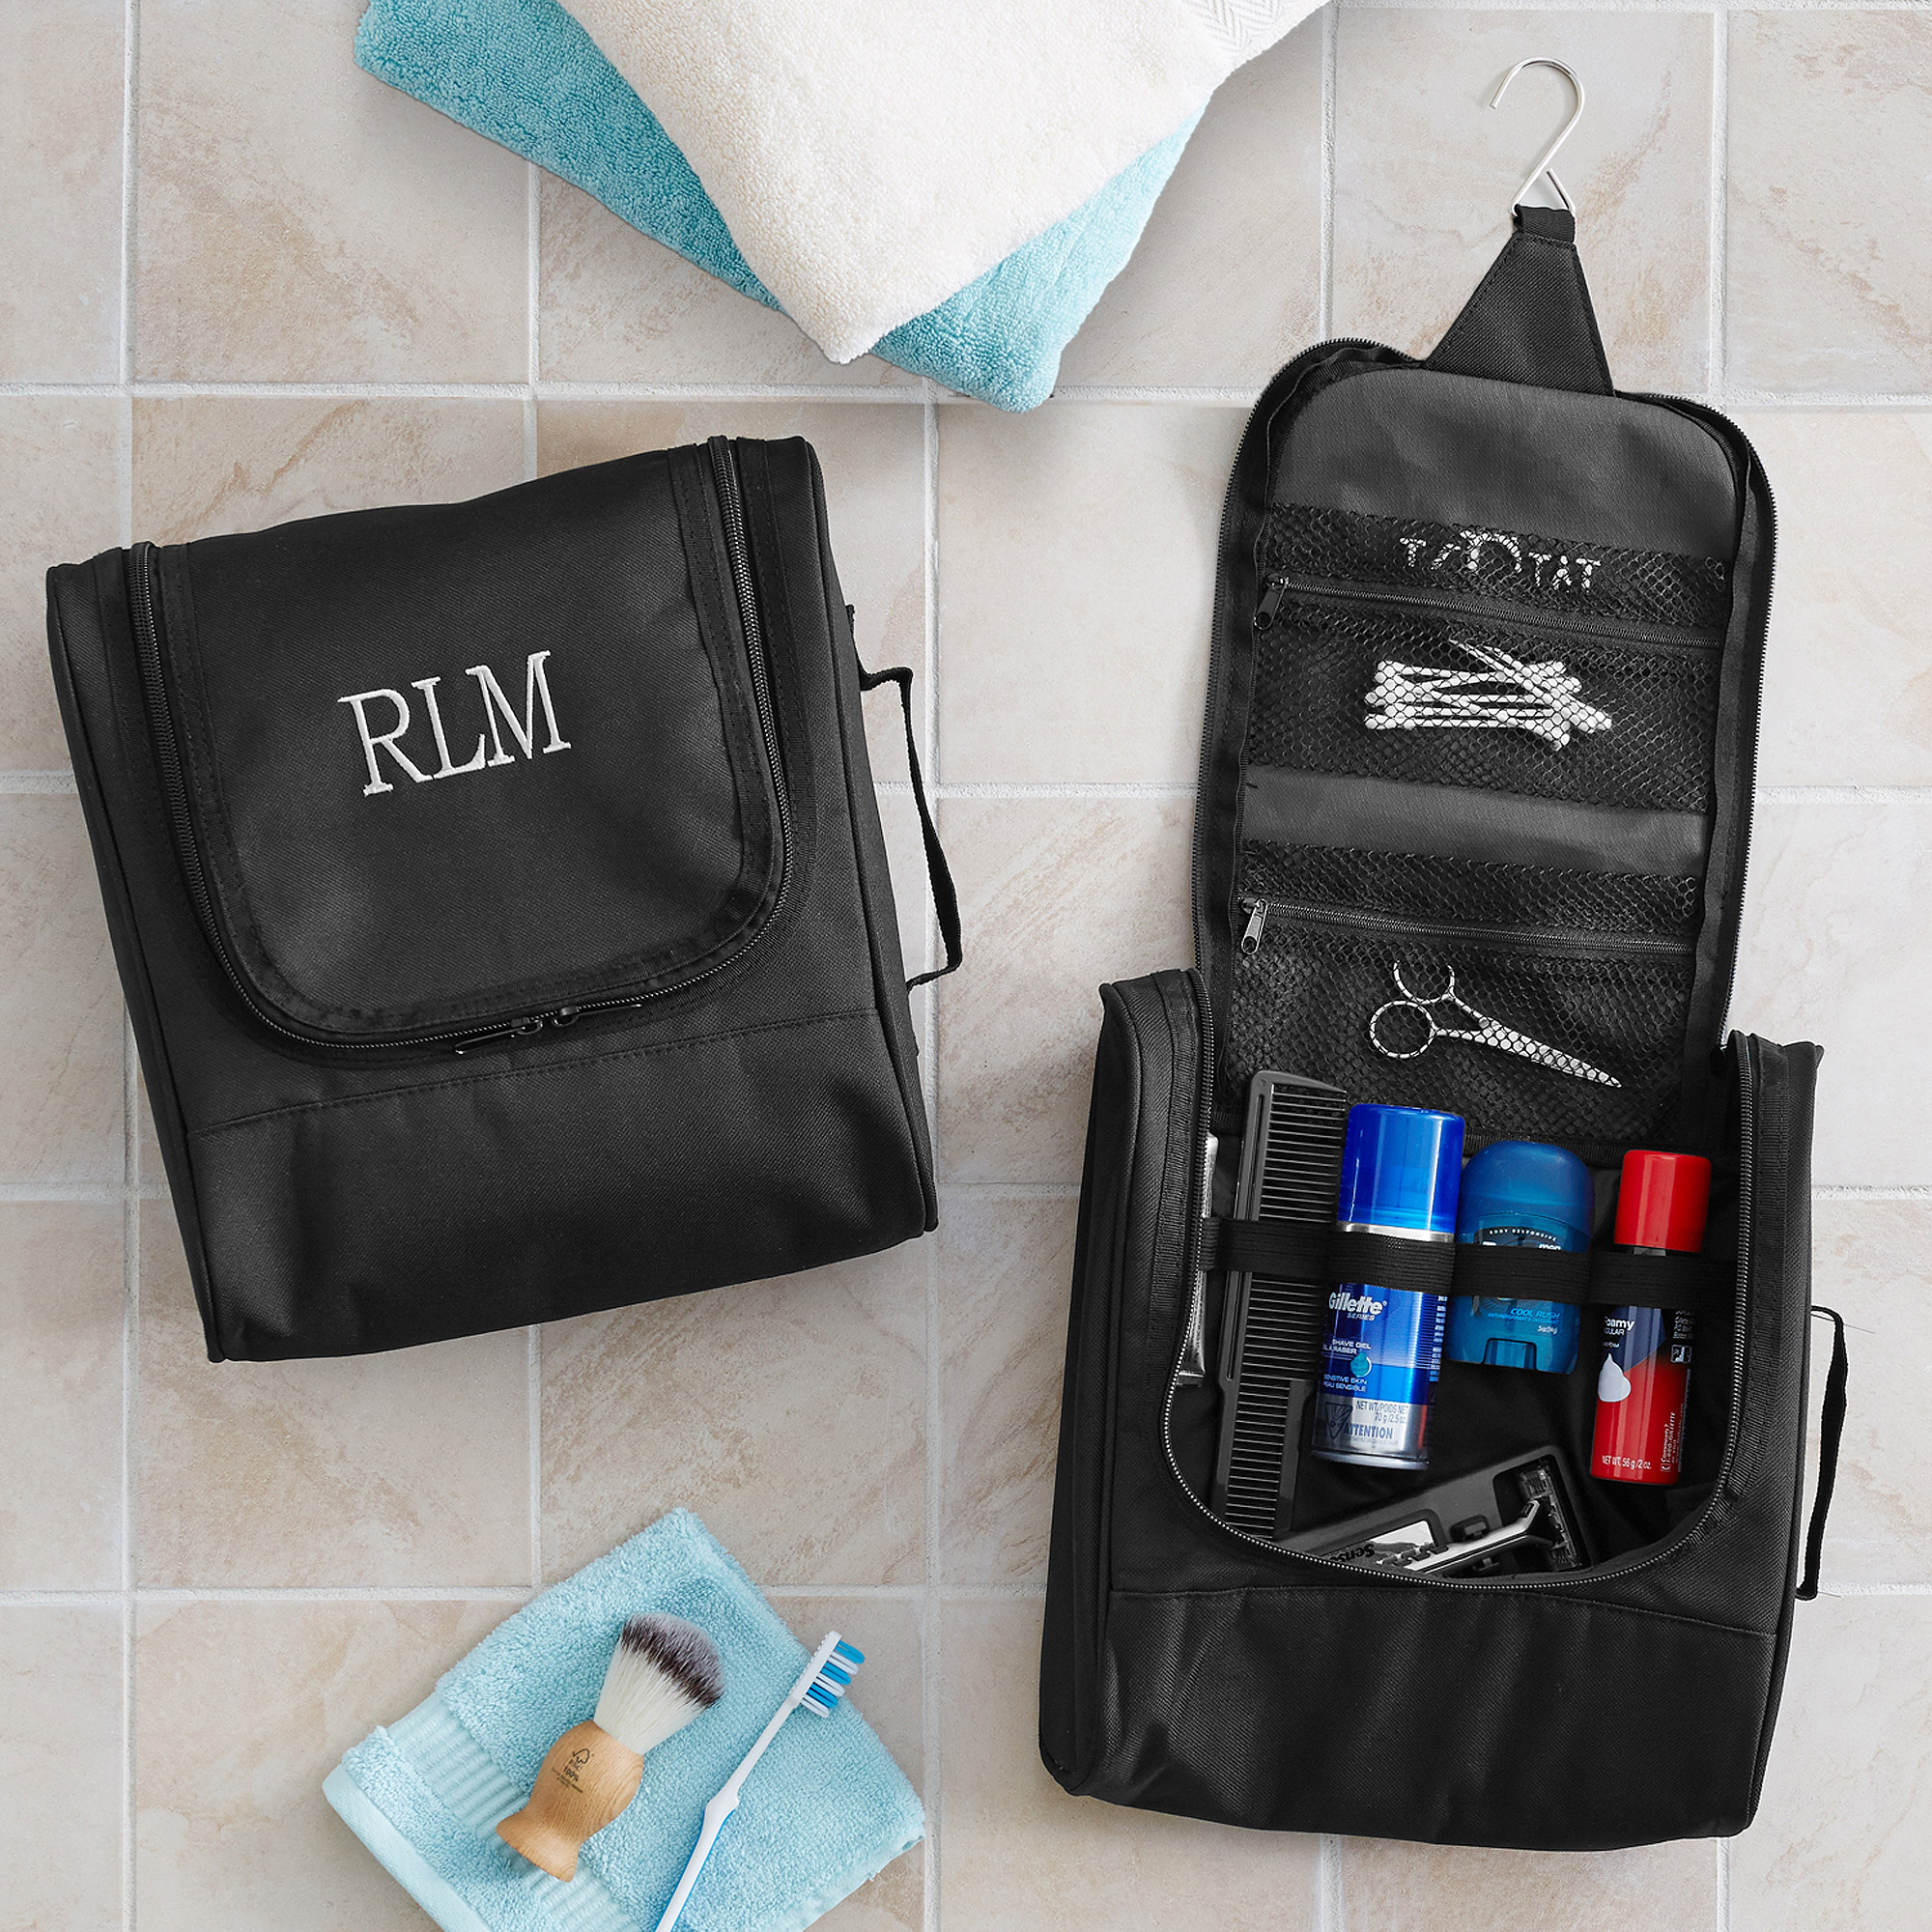 3630ab1ff8a3 Personalized hanging toiletry travel bag jpg 450x450 Walmart toiletry bag